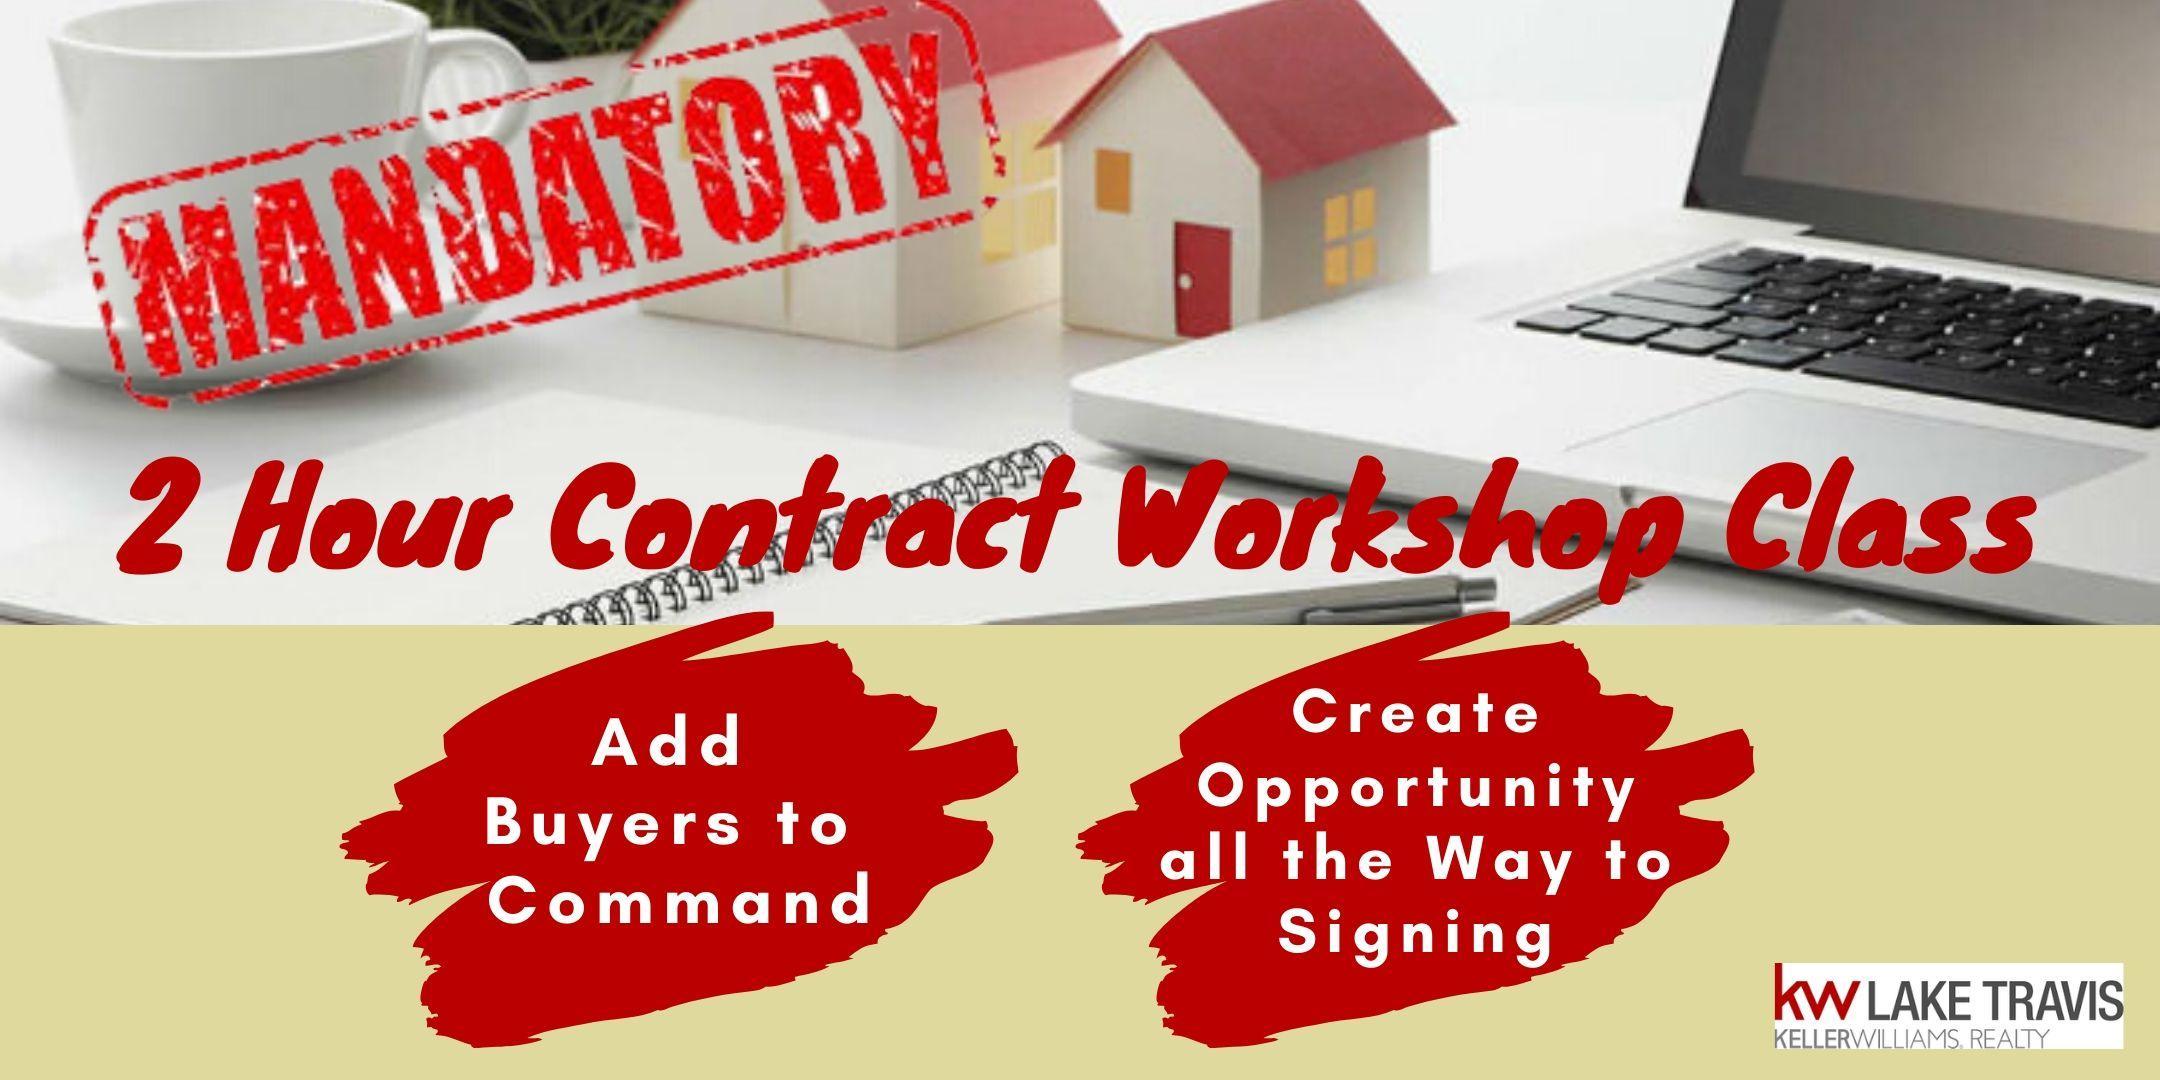 2 Hour Contract Workshop Class